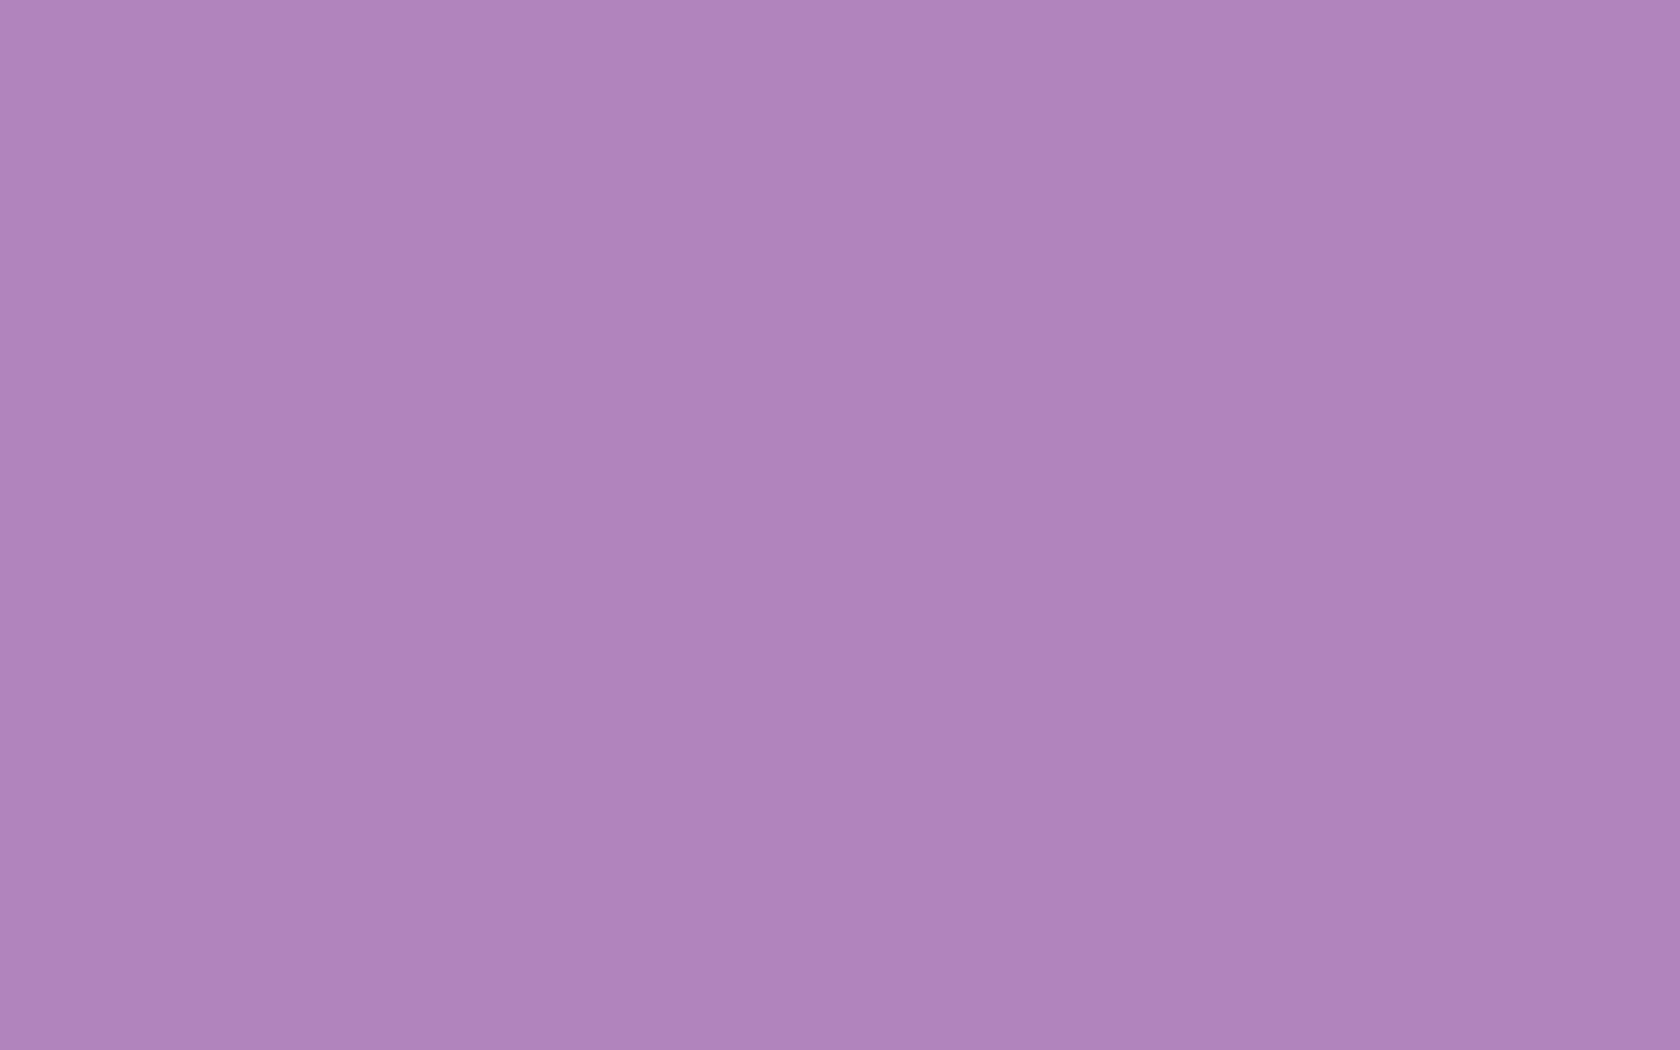 1680x1050 African Violet Solid Color Background